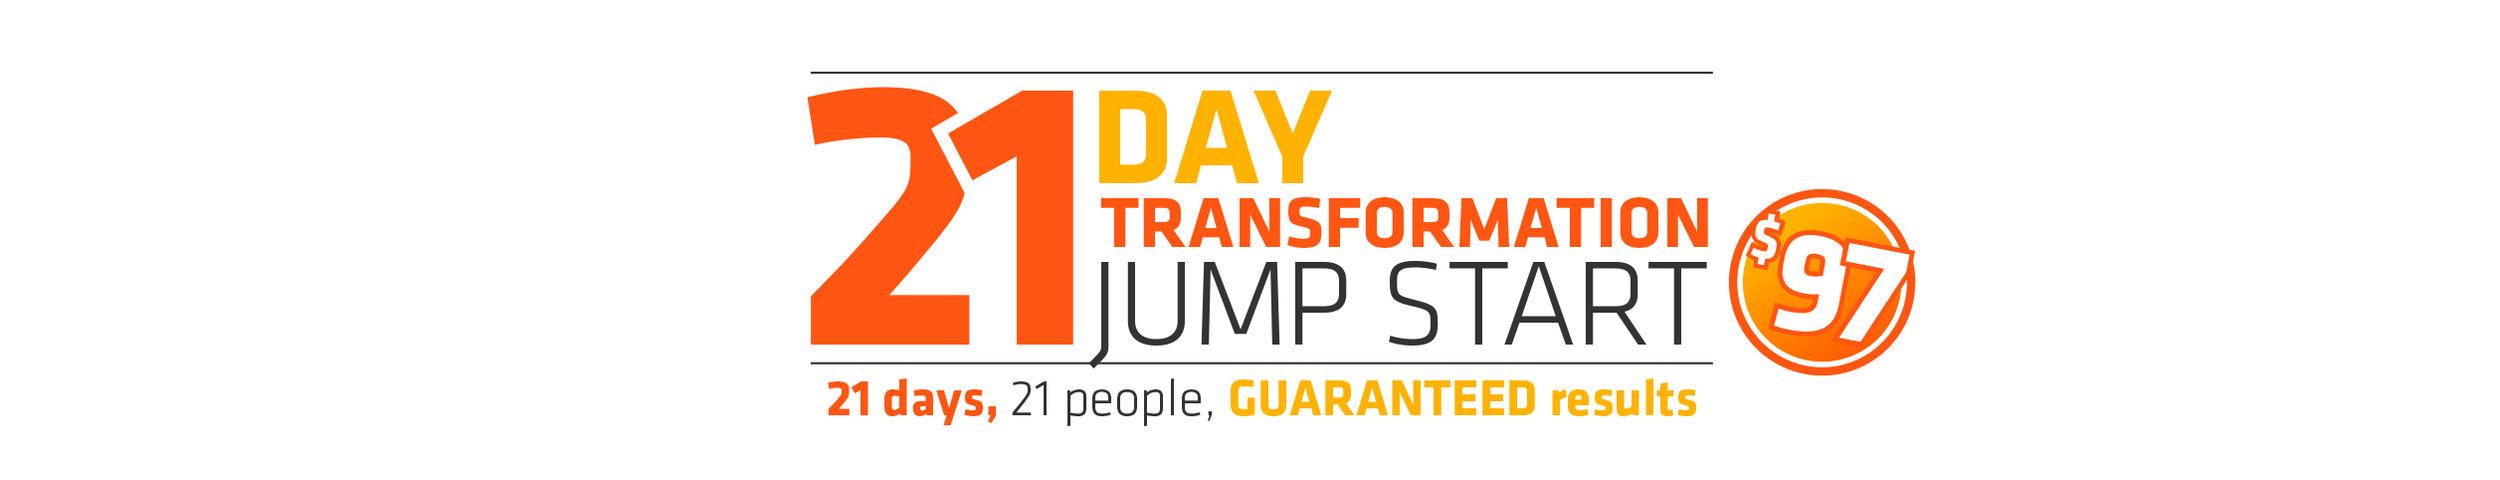 21-DayJumpstart-info.jpg